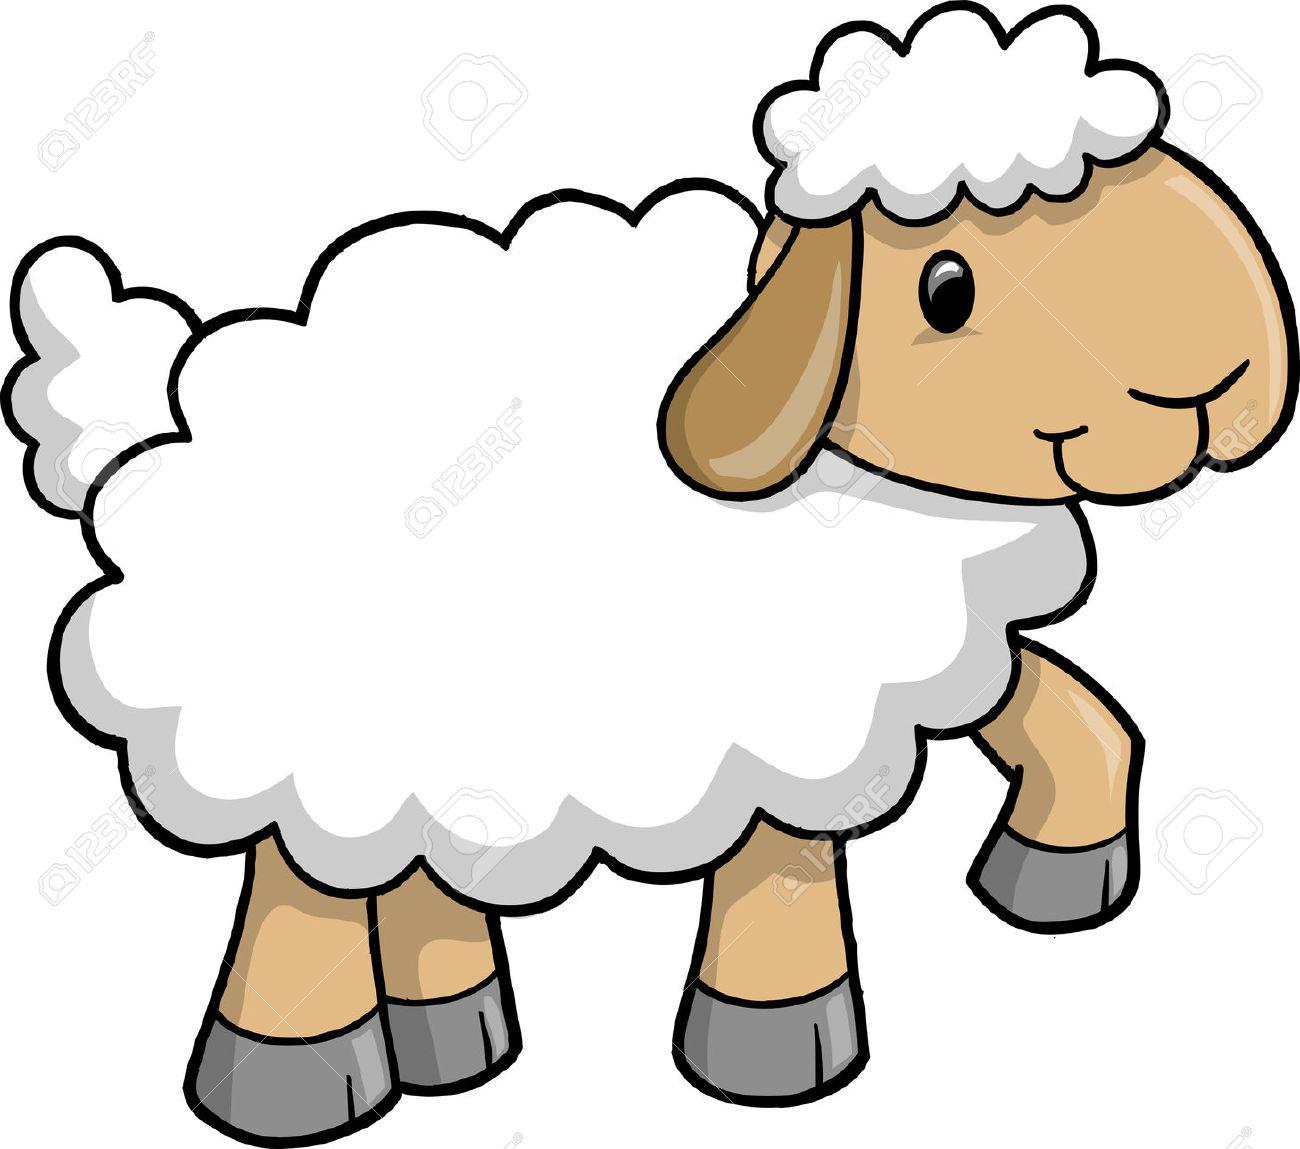 5+ Clip Art Sheep.